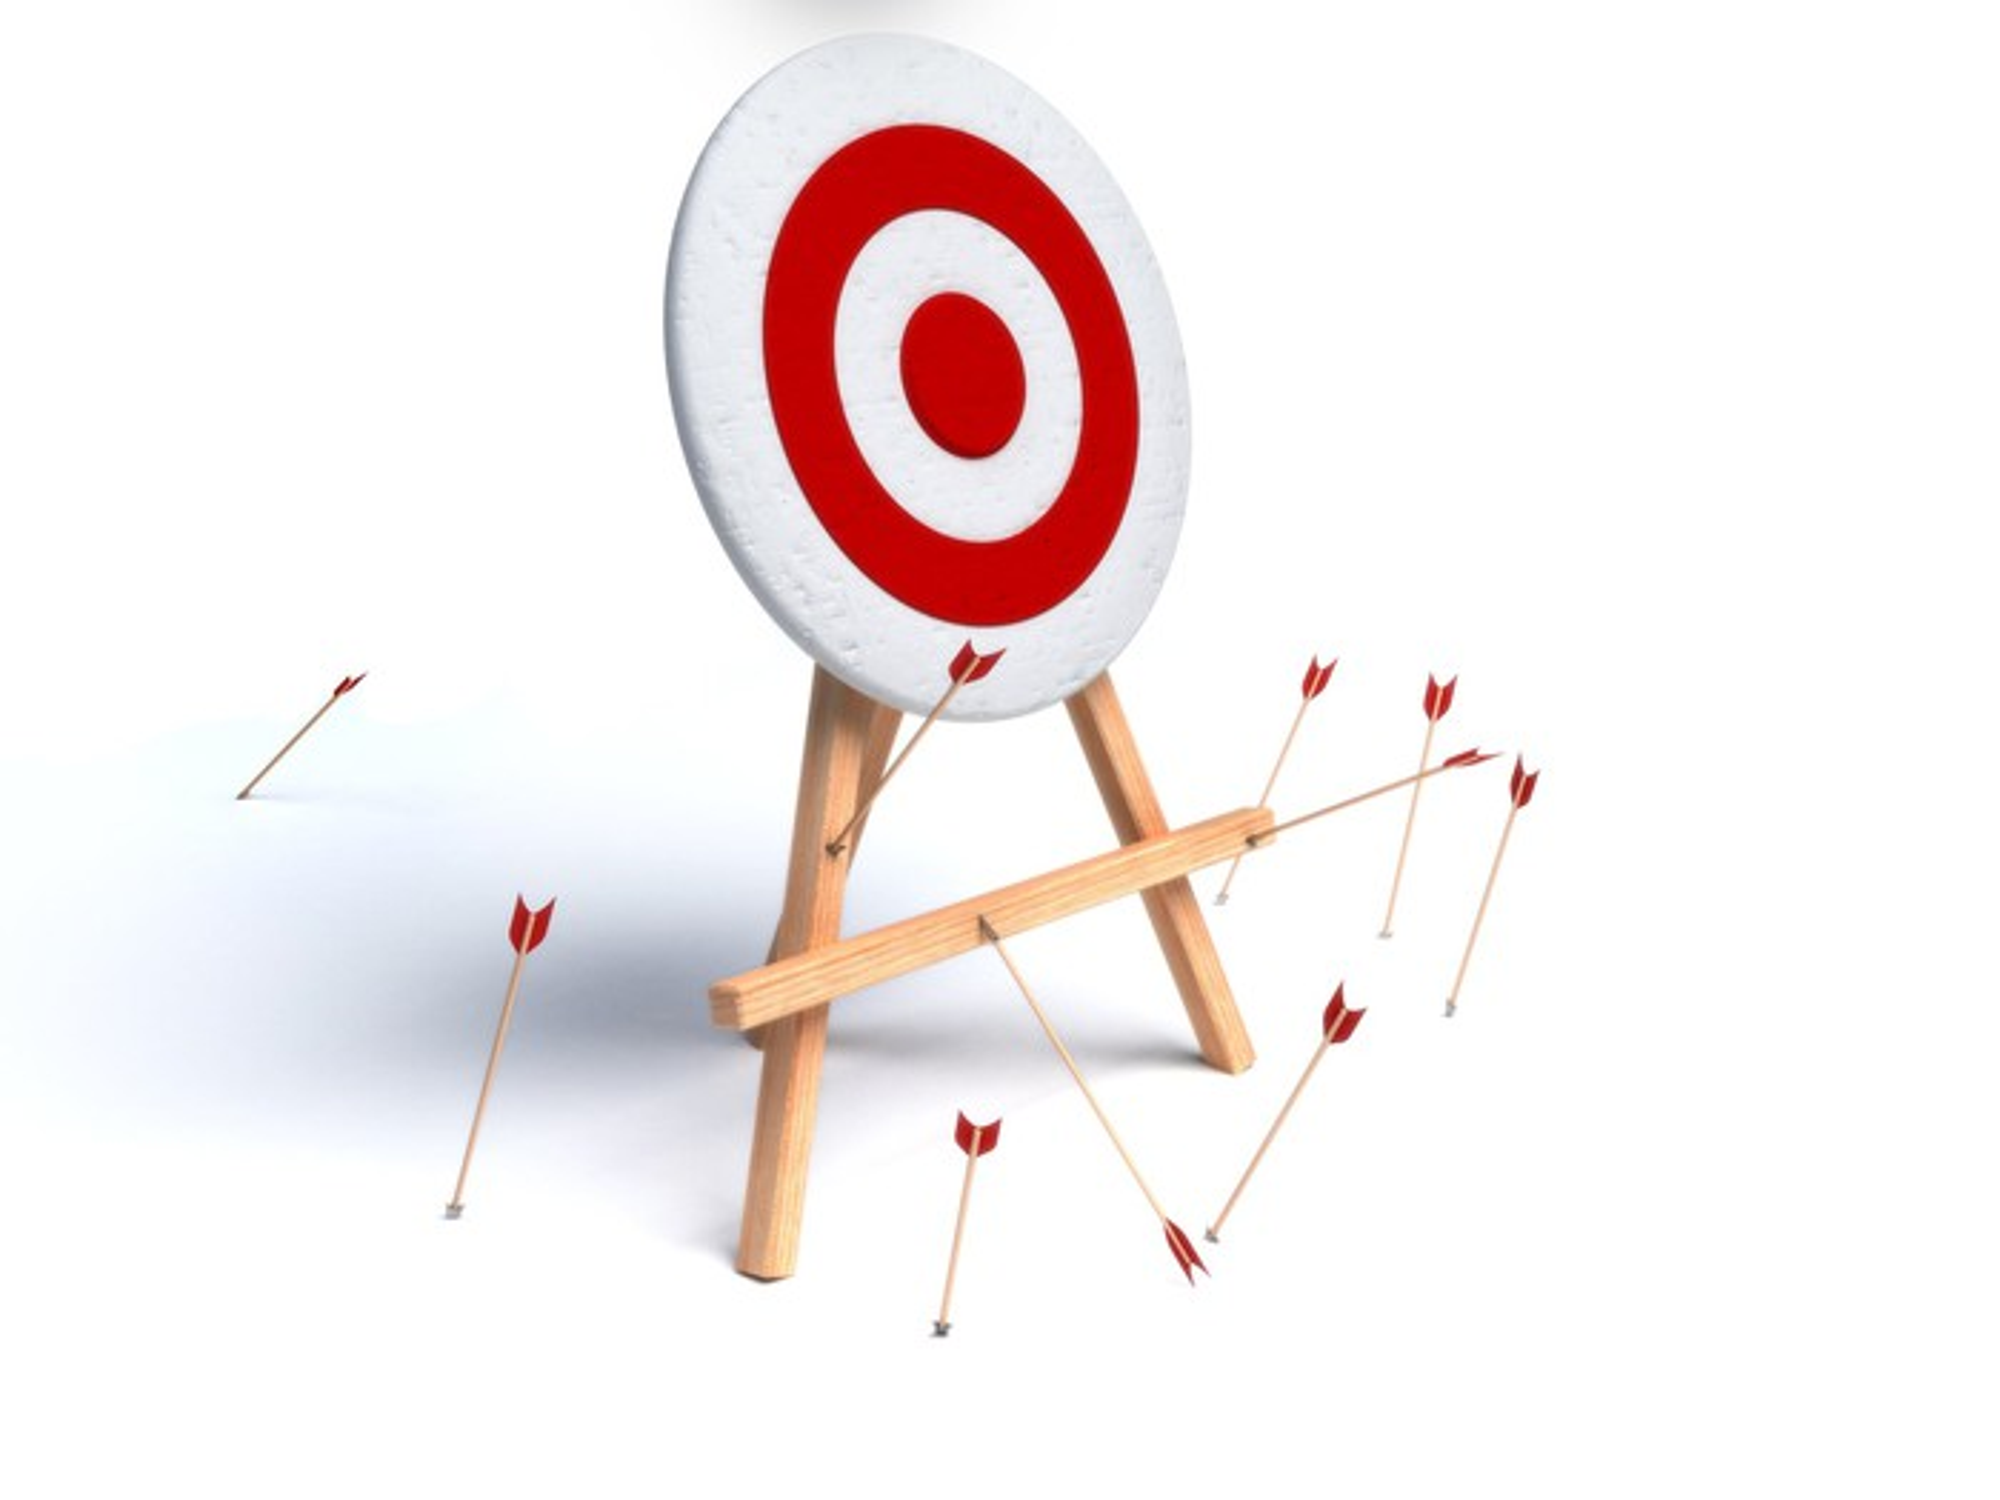 Arrows missing bull's-eye on target